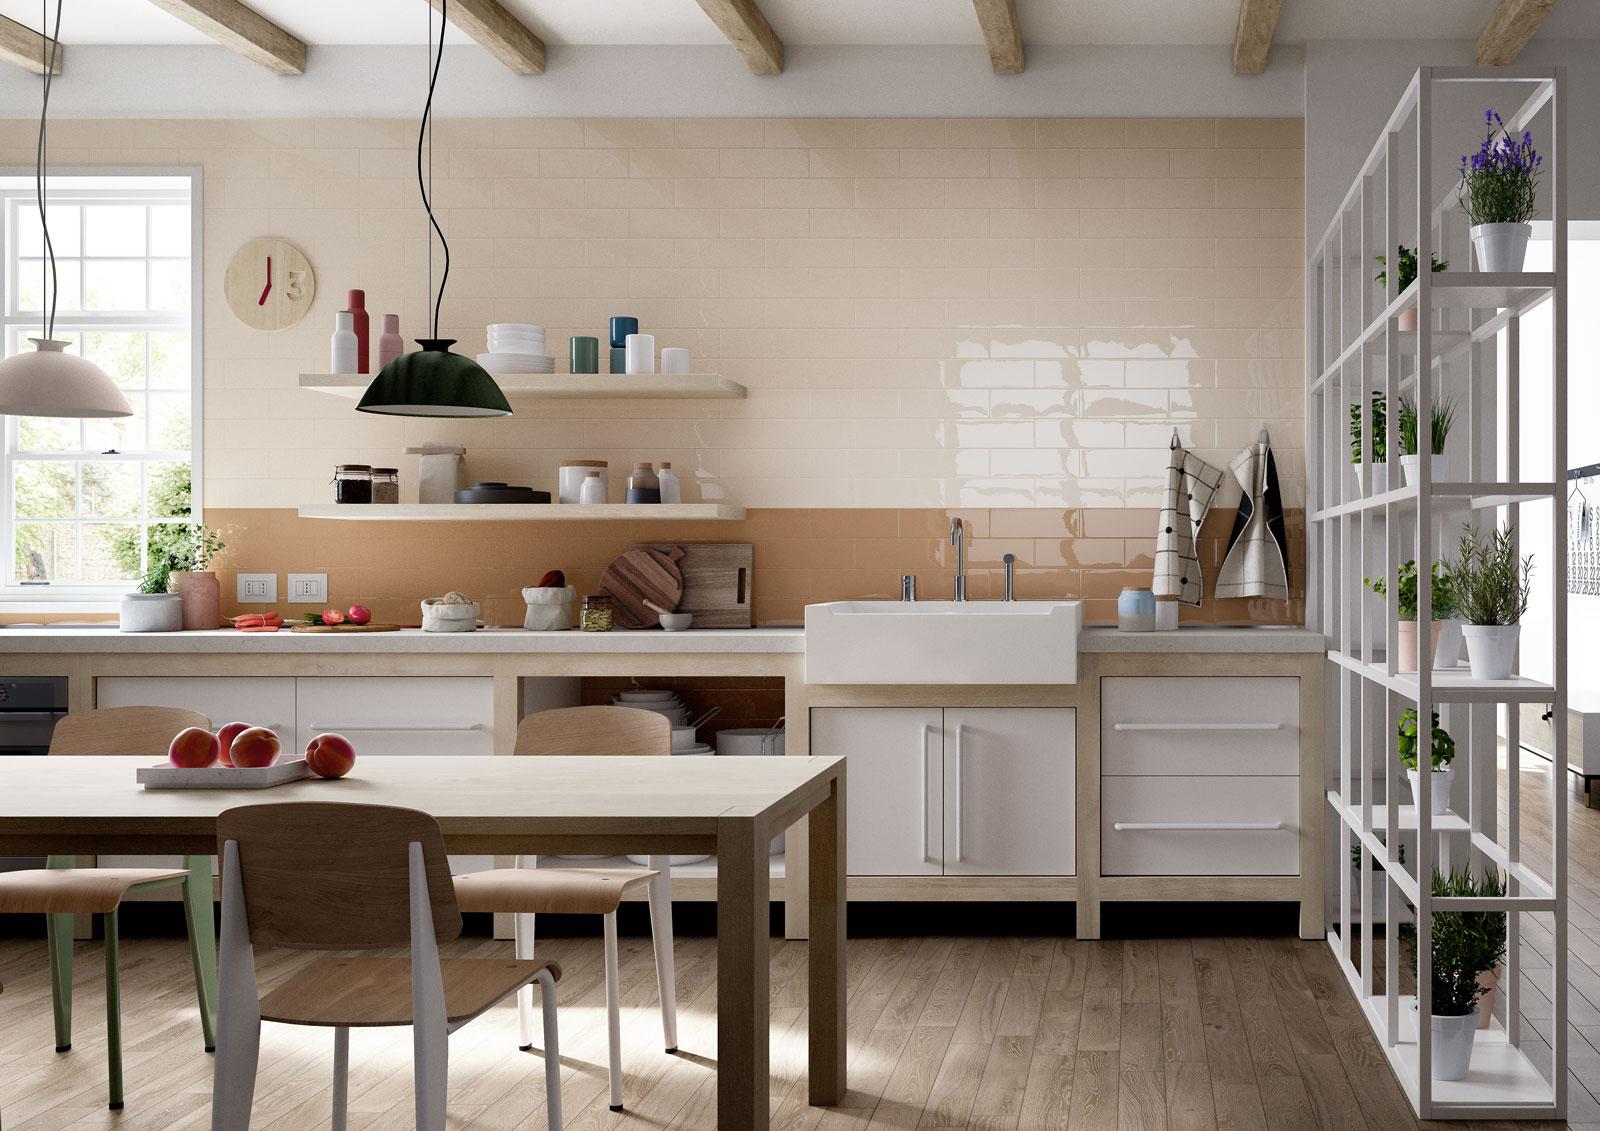 Mellow piastrelle ceramica da rivestimento marazzi - Piastrelle da rivestimento cucina ...